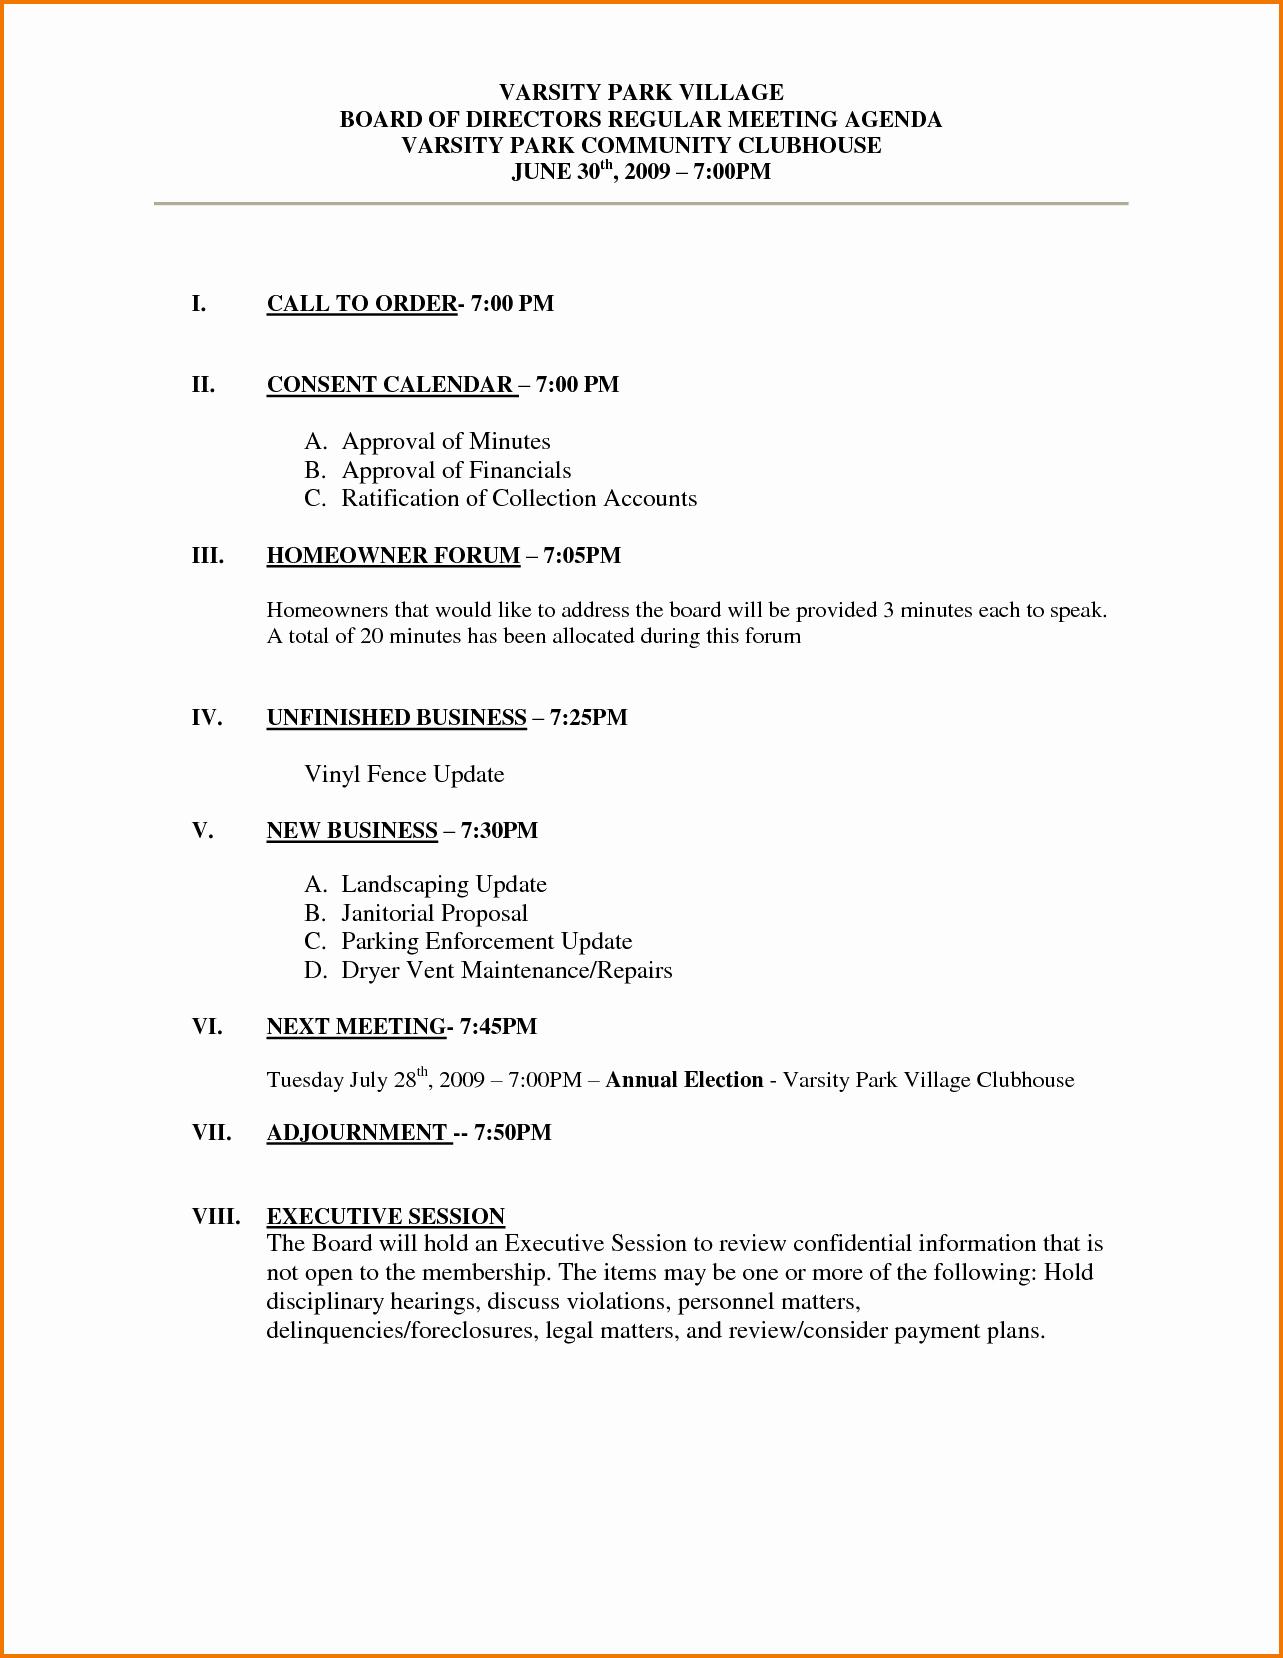 Sample Of A Meeting Agenda Beautiful 6 Meeting Agenda Example